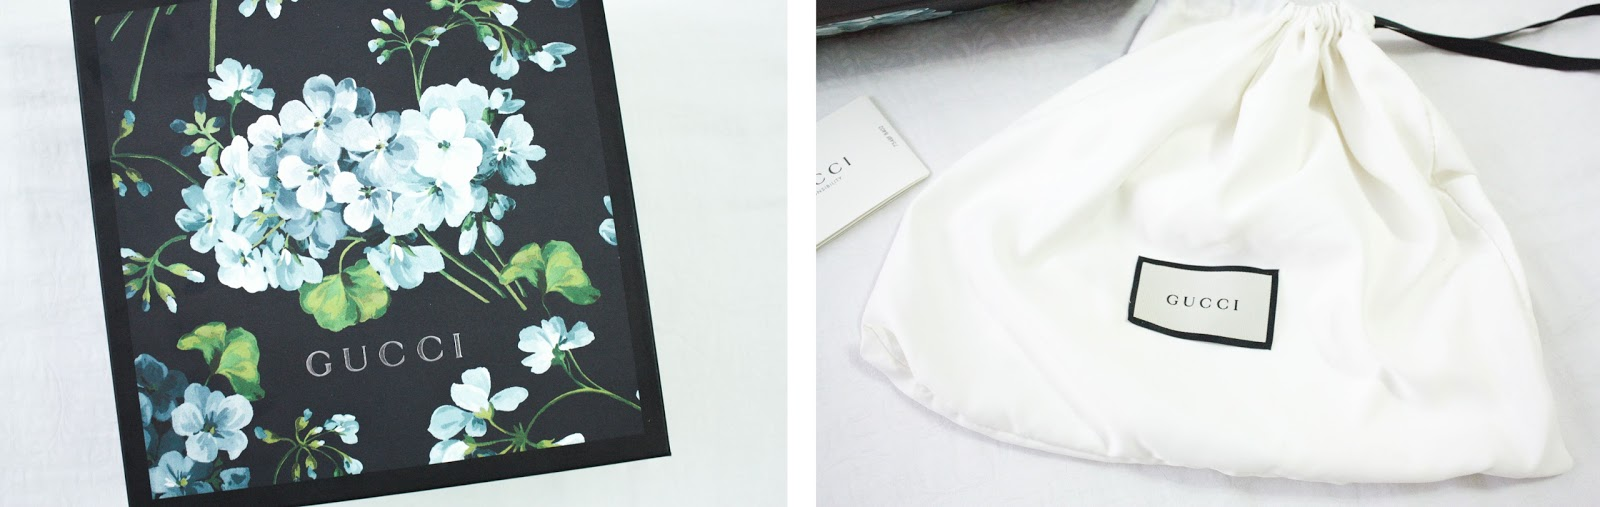 82ba452f6367d8 REVIEW: gucci soho disco bag | the sartorial samurai